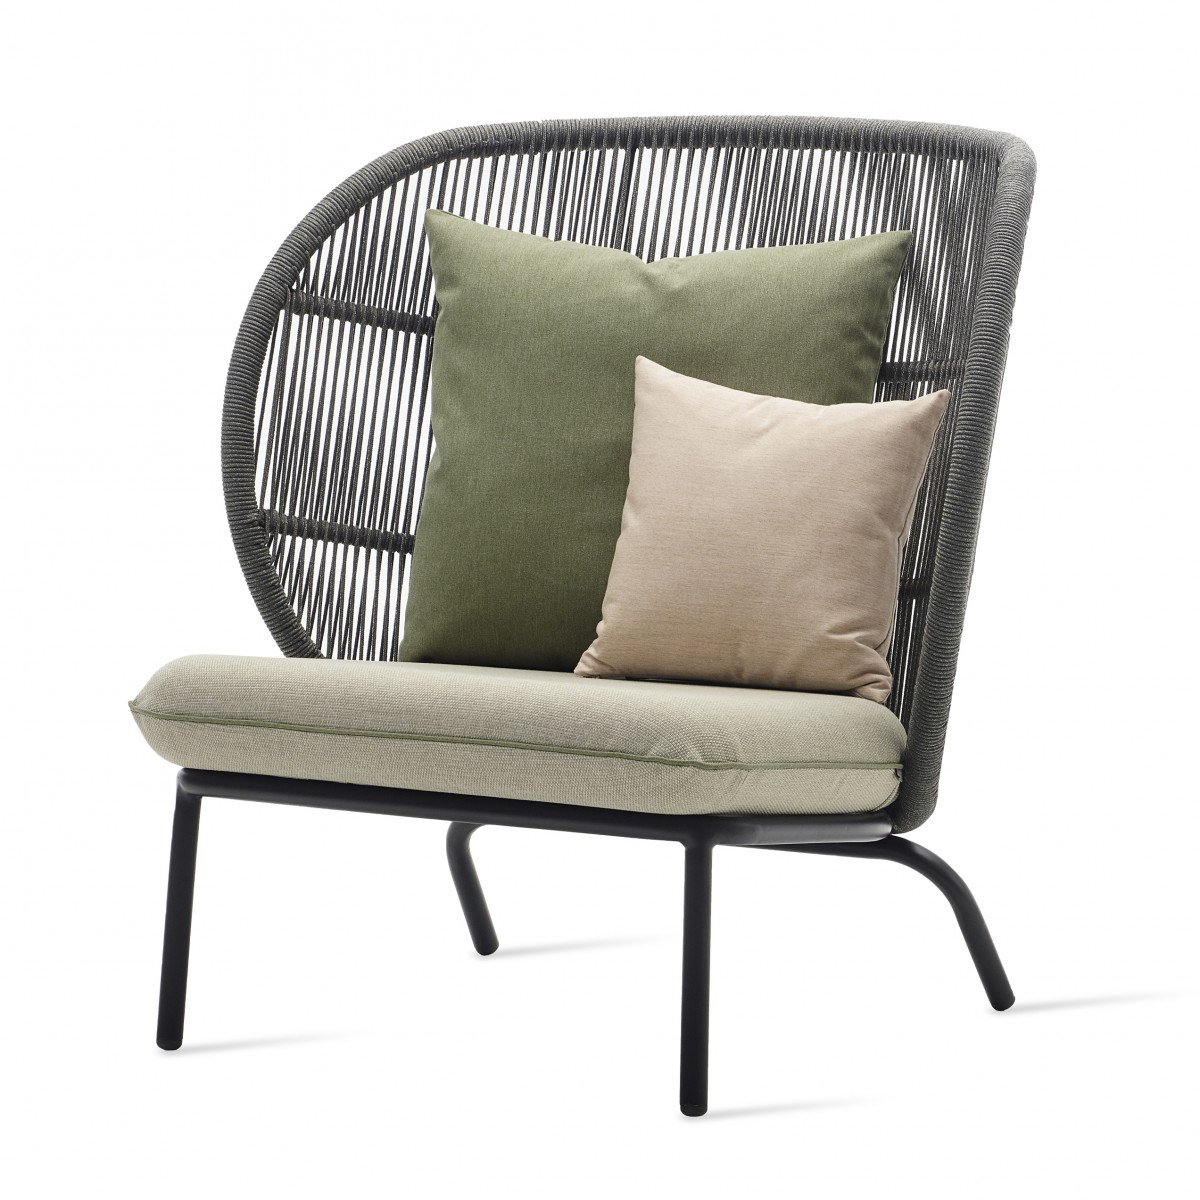 KODO COCOON Armchair - VINCENT SHEPPARD